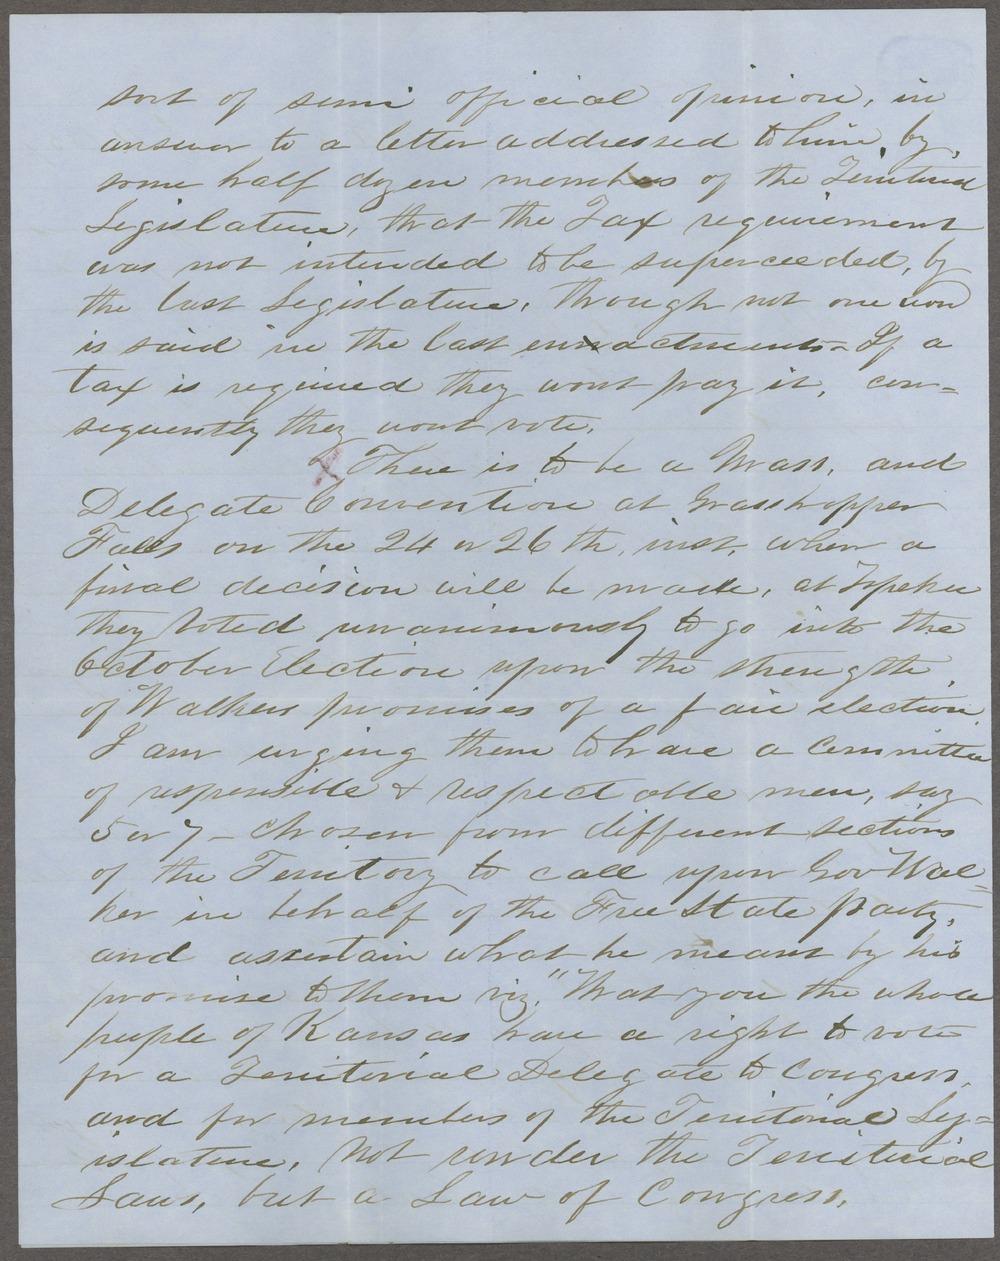 Thomas J. Marsh to George L. Stearns - 2